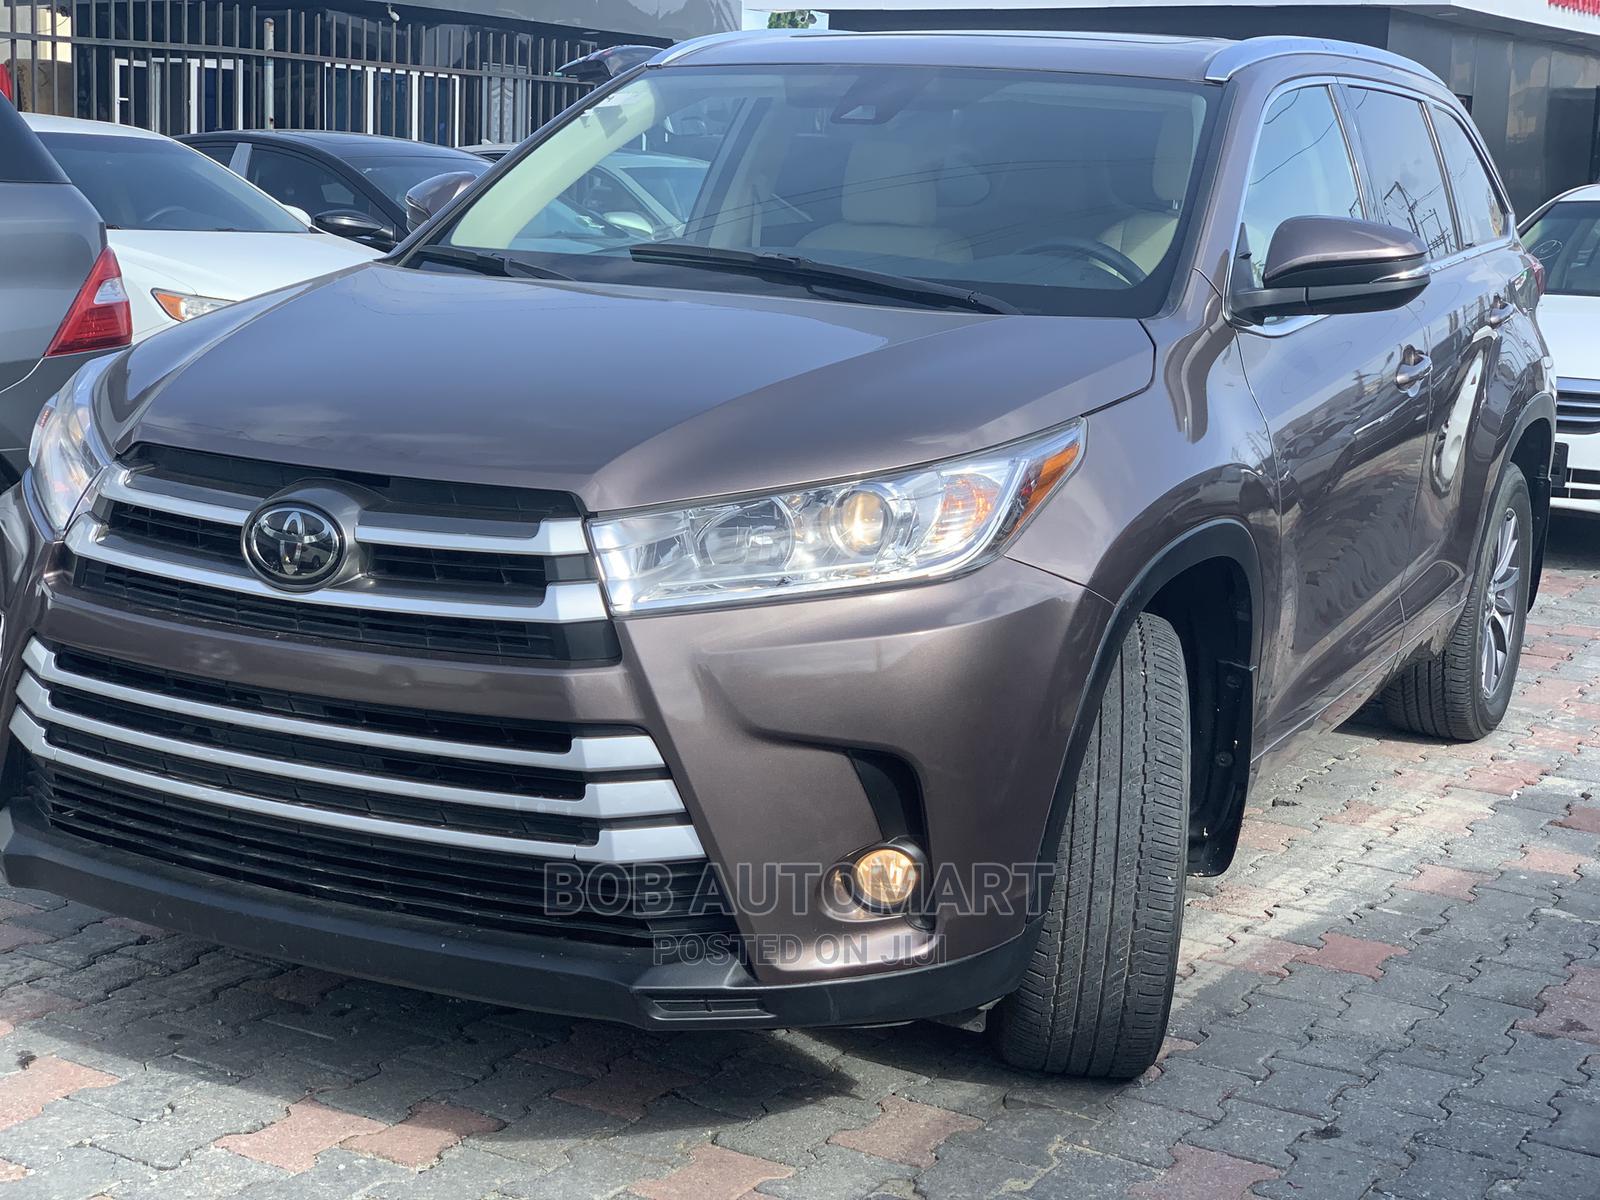 Toyota Highlander 2018 XLE 4x4 V6 (3.5L 6cyl 8A) Brown | Cars for sale in Lekki, Lagos State, Nigeria